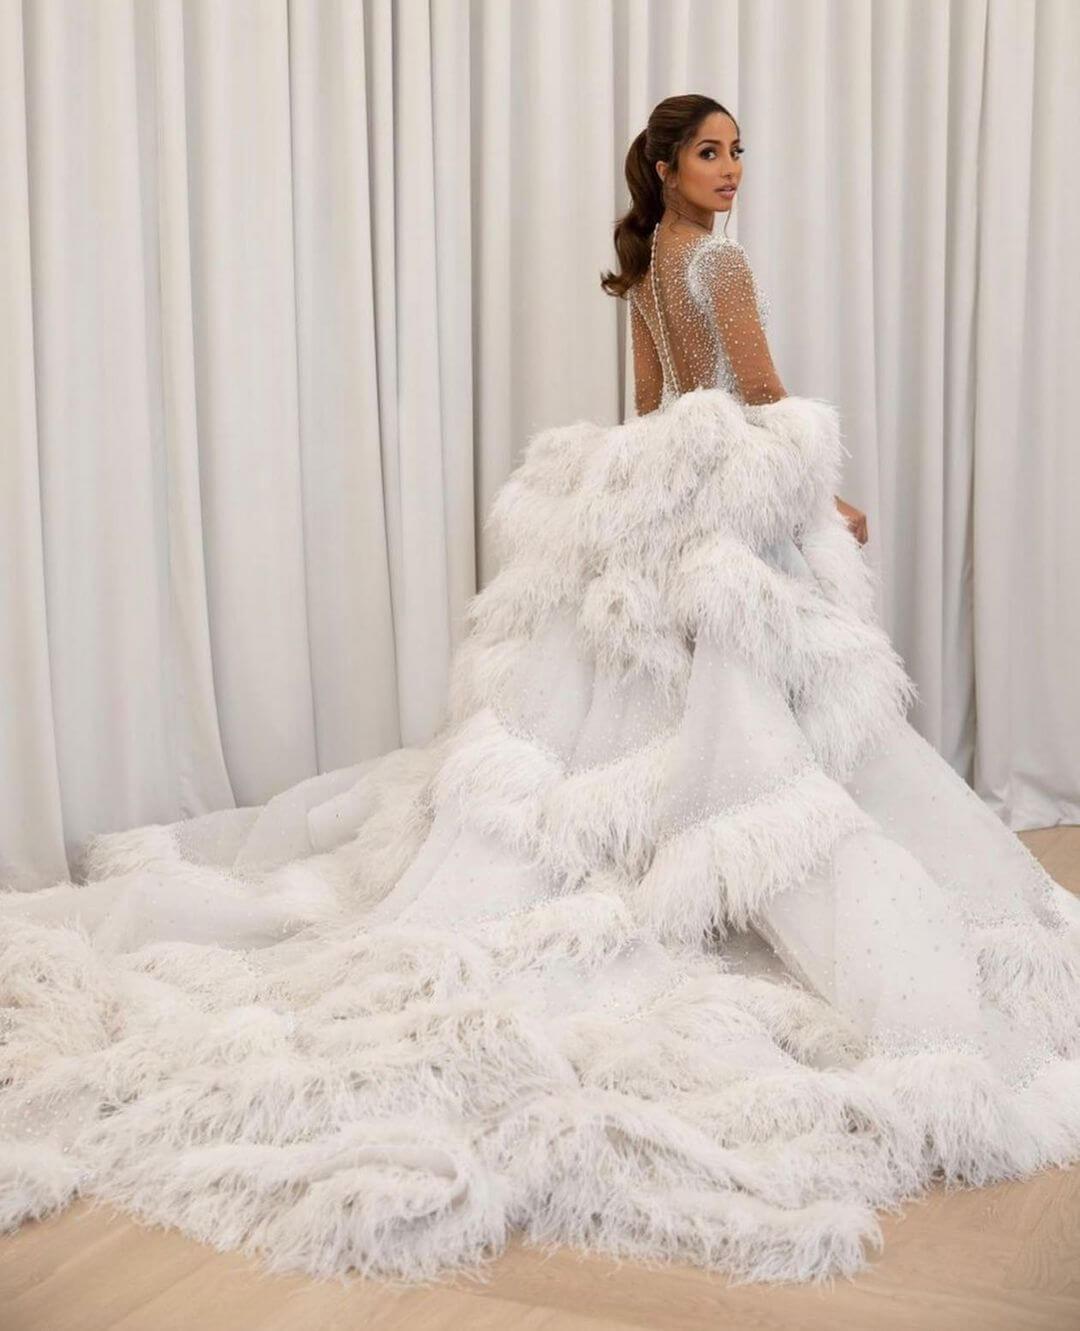 The unworn extra train on Maria Thattil, Miss Australia's evening gown